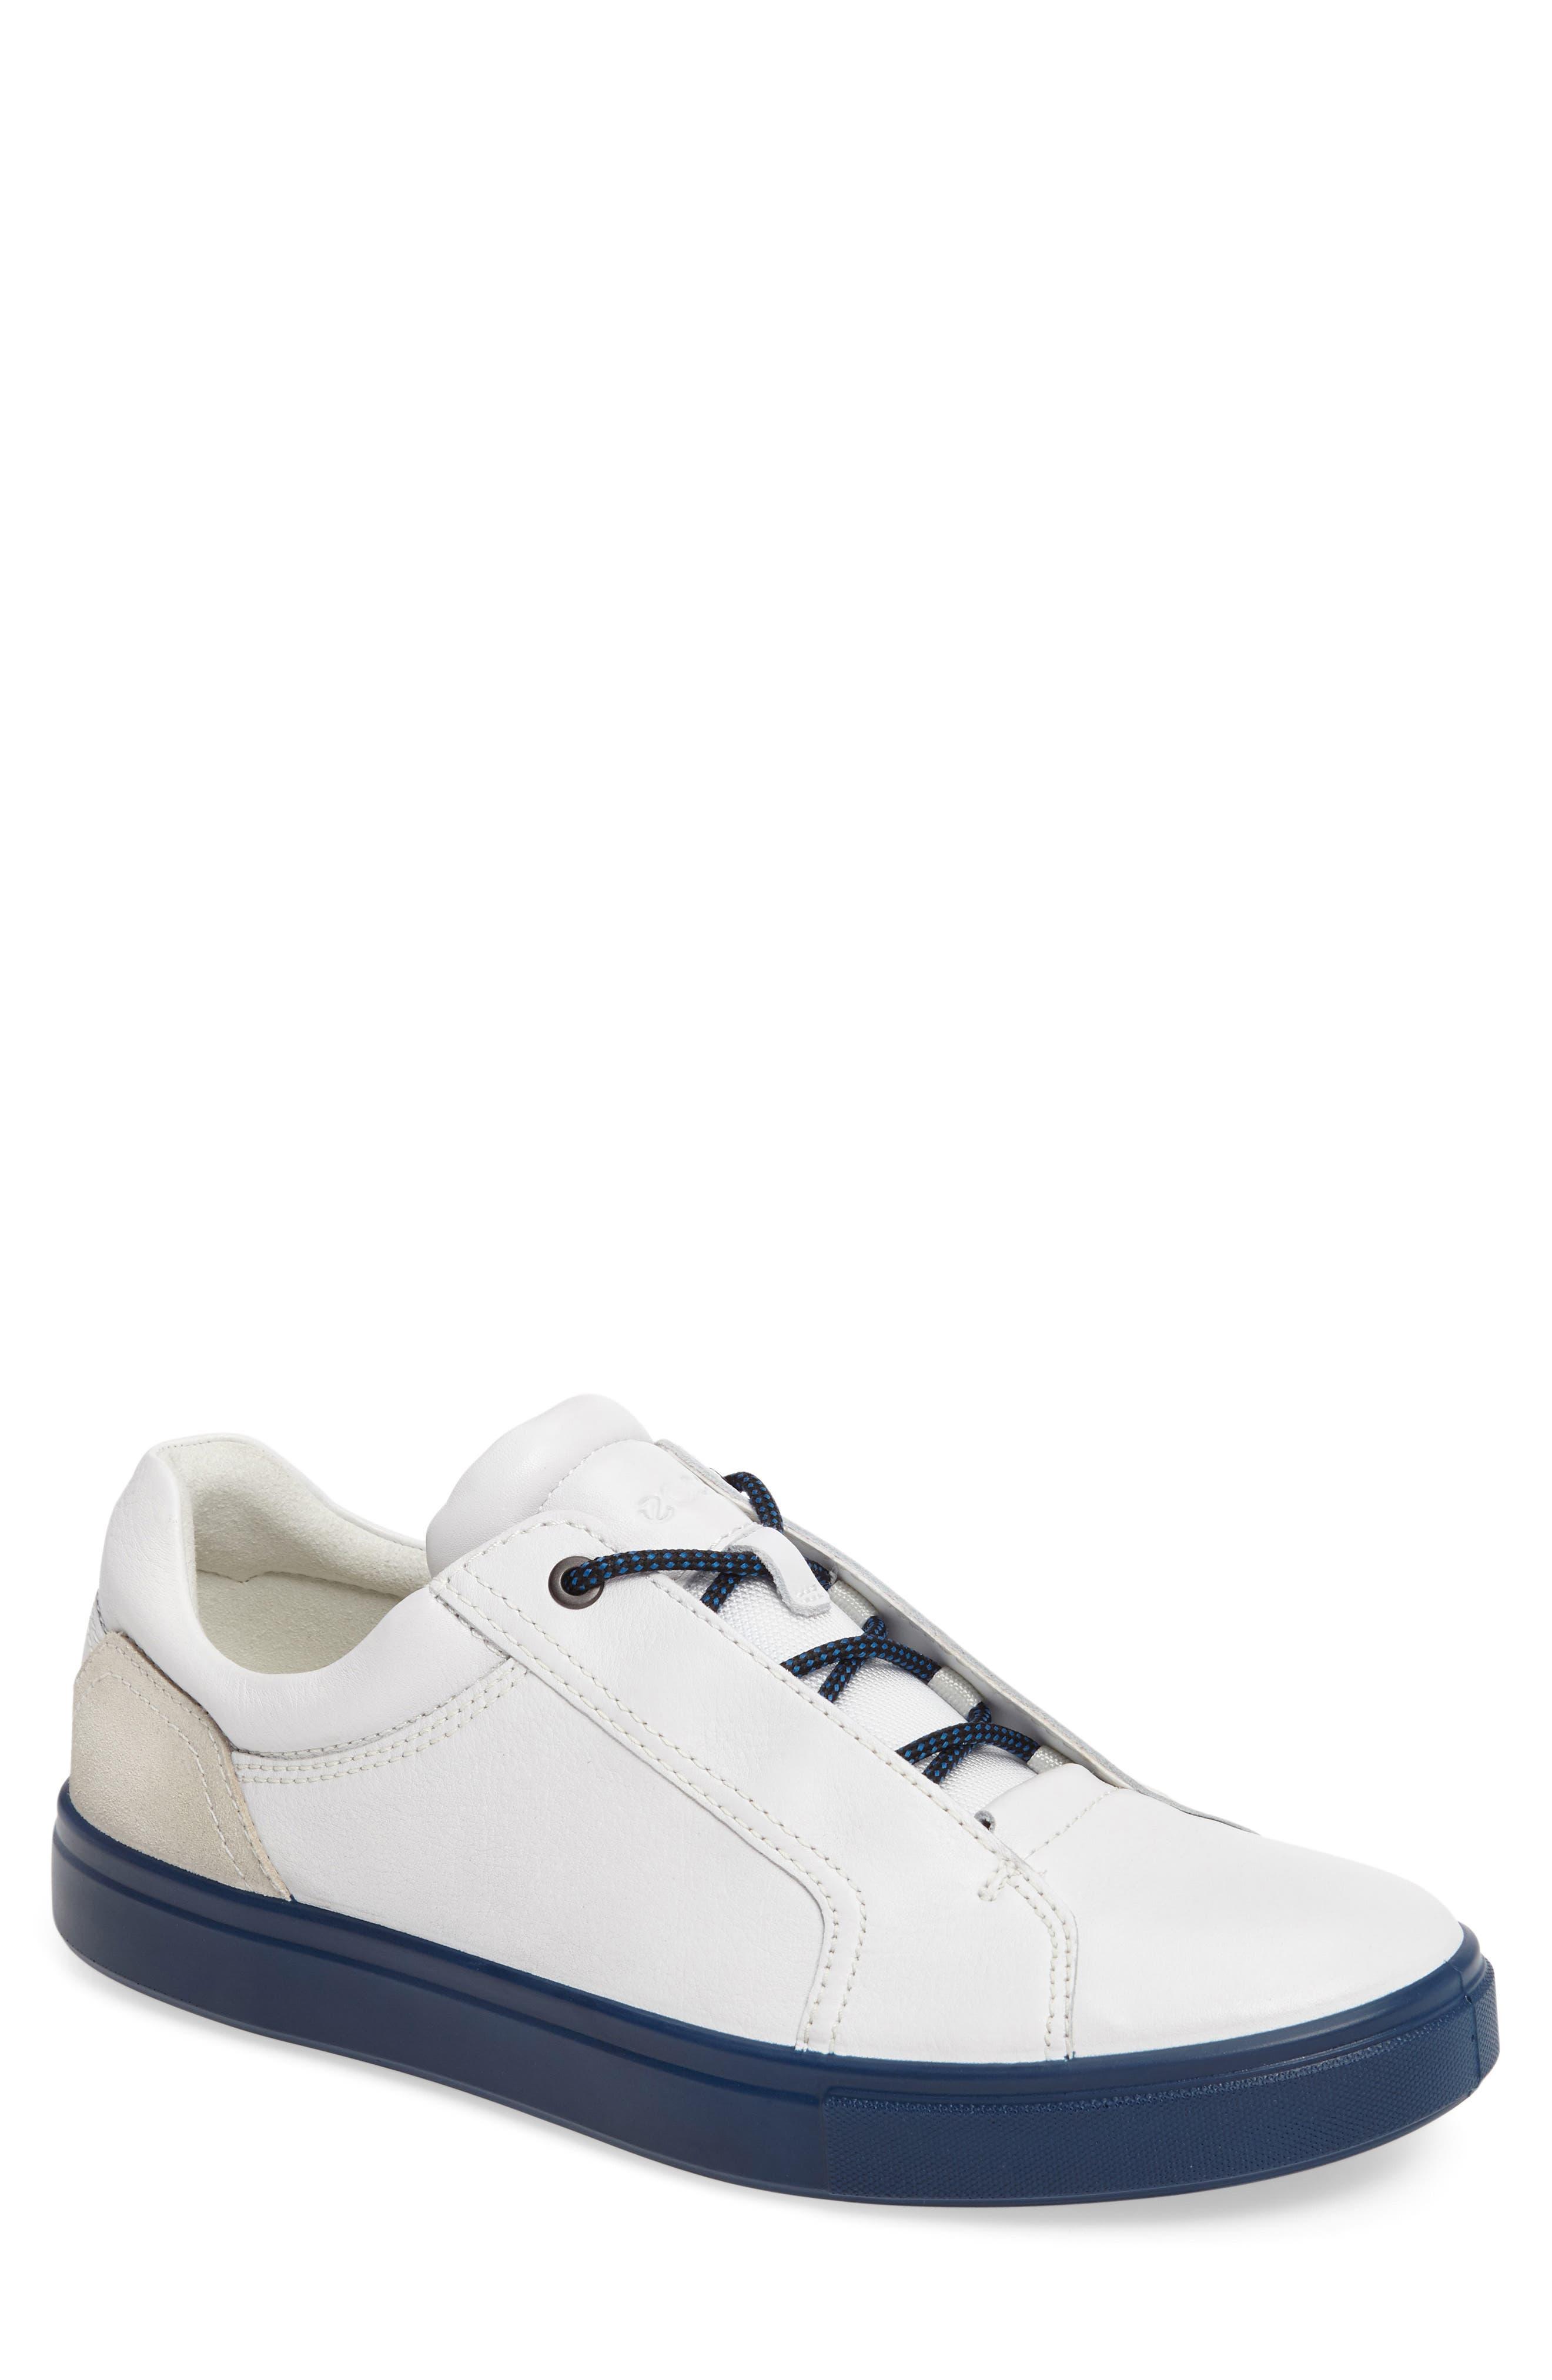 Kyle Sneaker,                             Main thumbnail 1, color,                             White